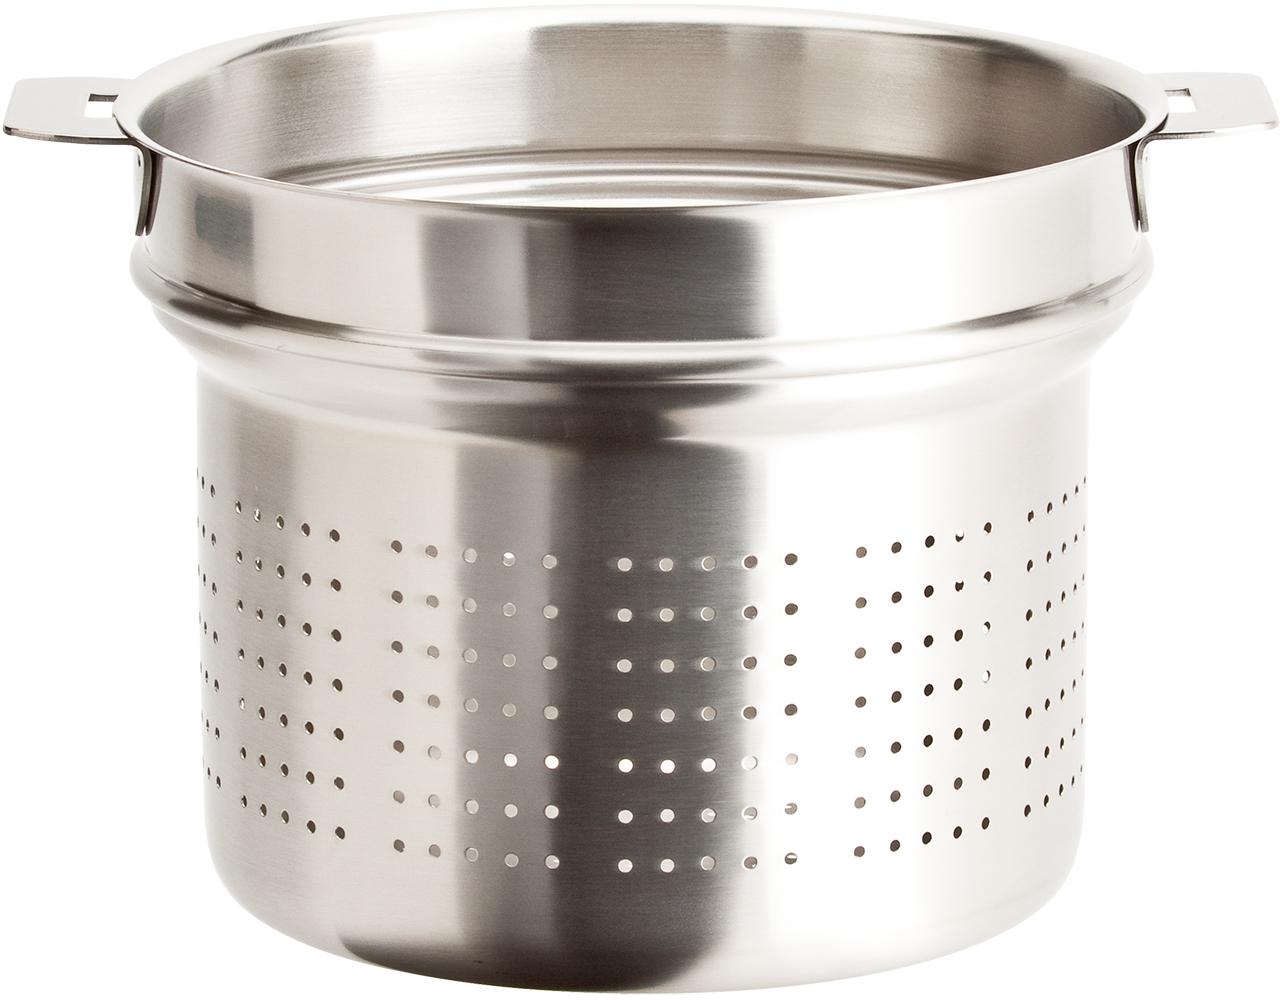 Cristel Strate L 18/10 Stainless Steel 7 Quart Pasta Insert